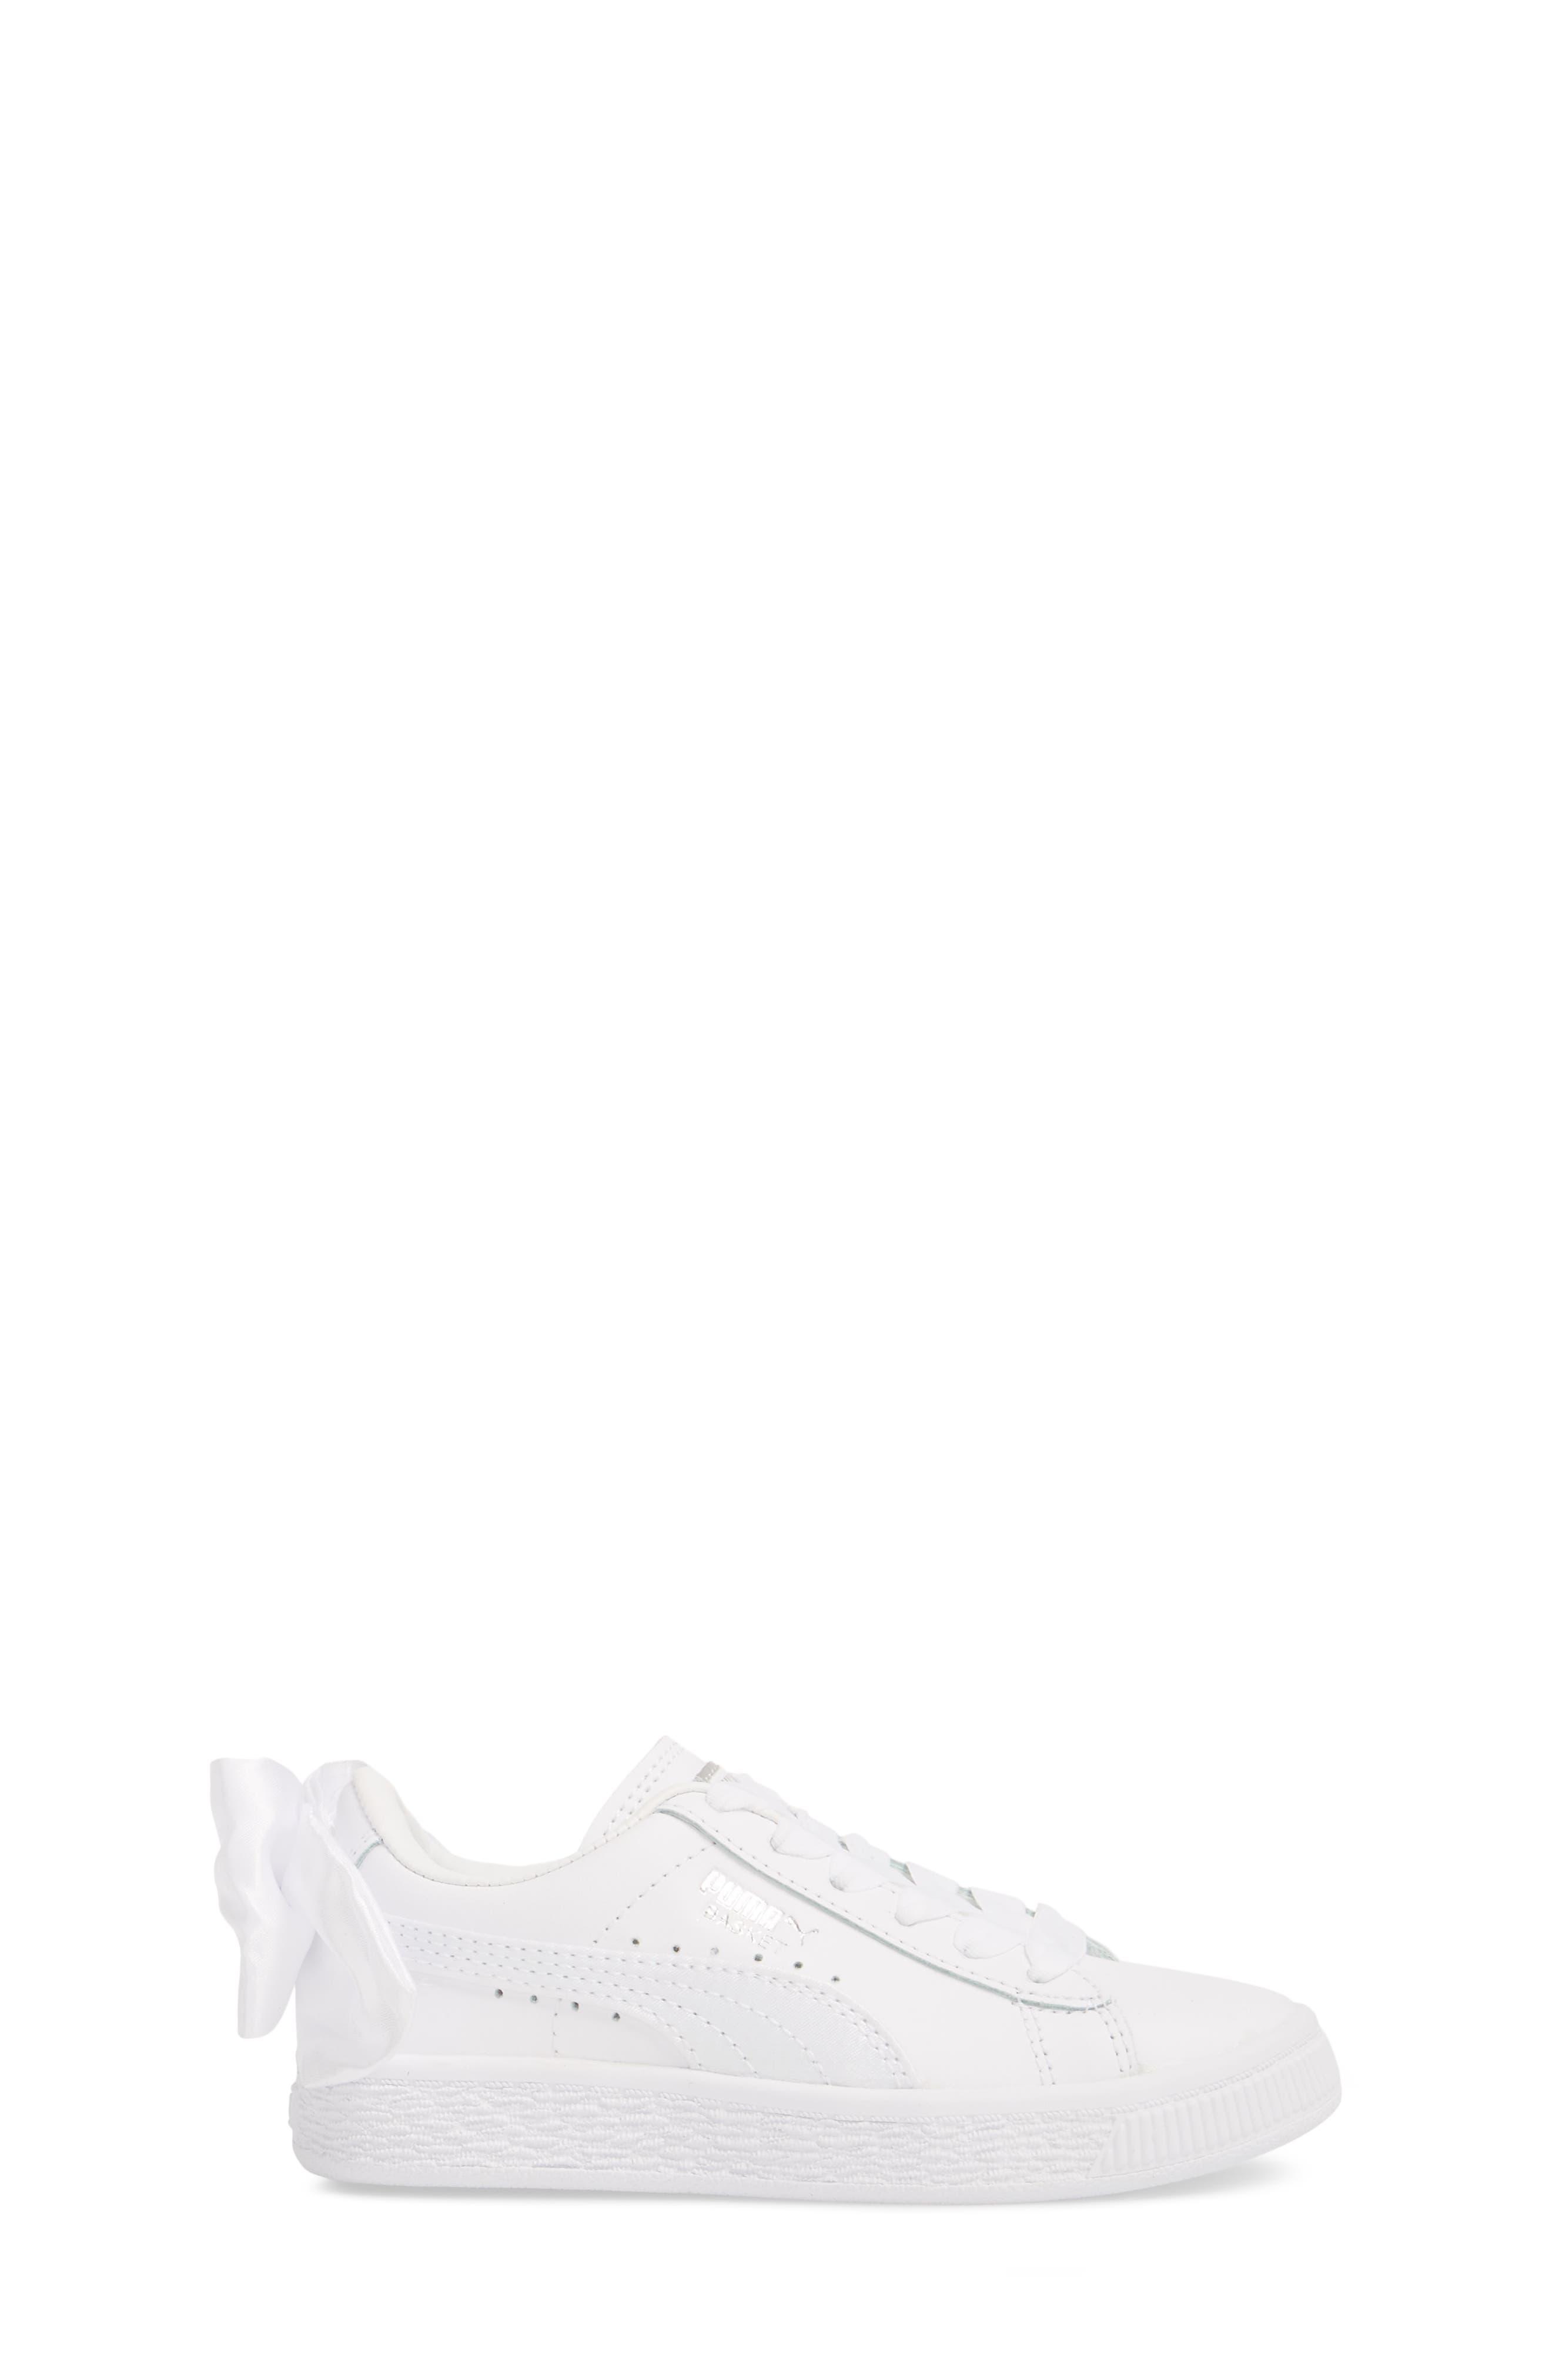 Basket Bow AC Sneaker,                             Alternate thumbnail 3, color,                             100